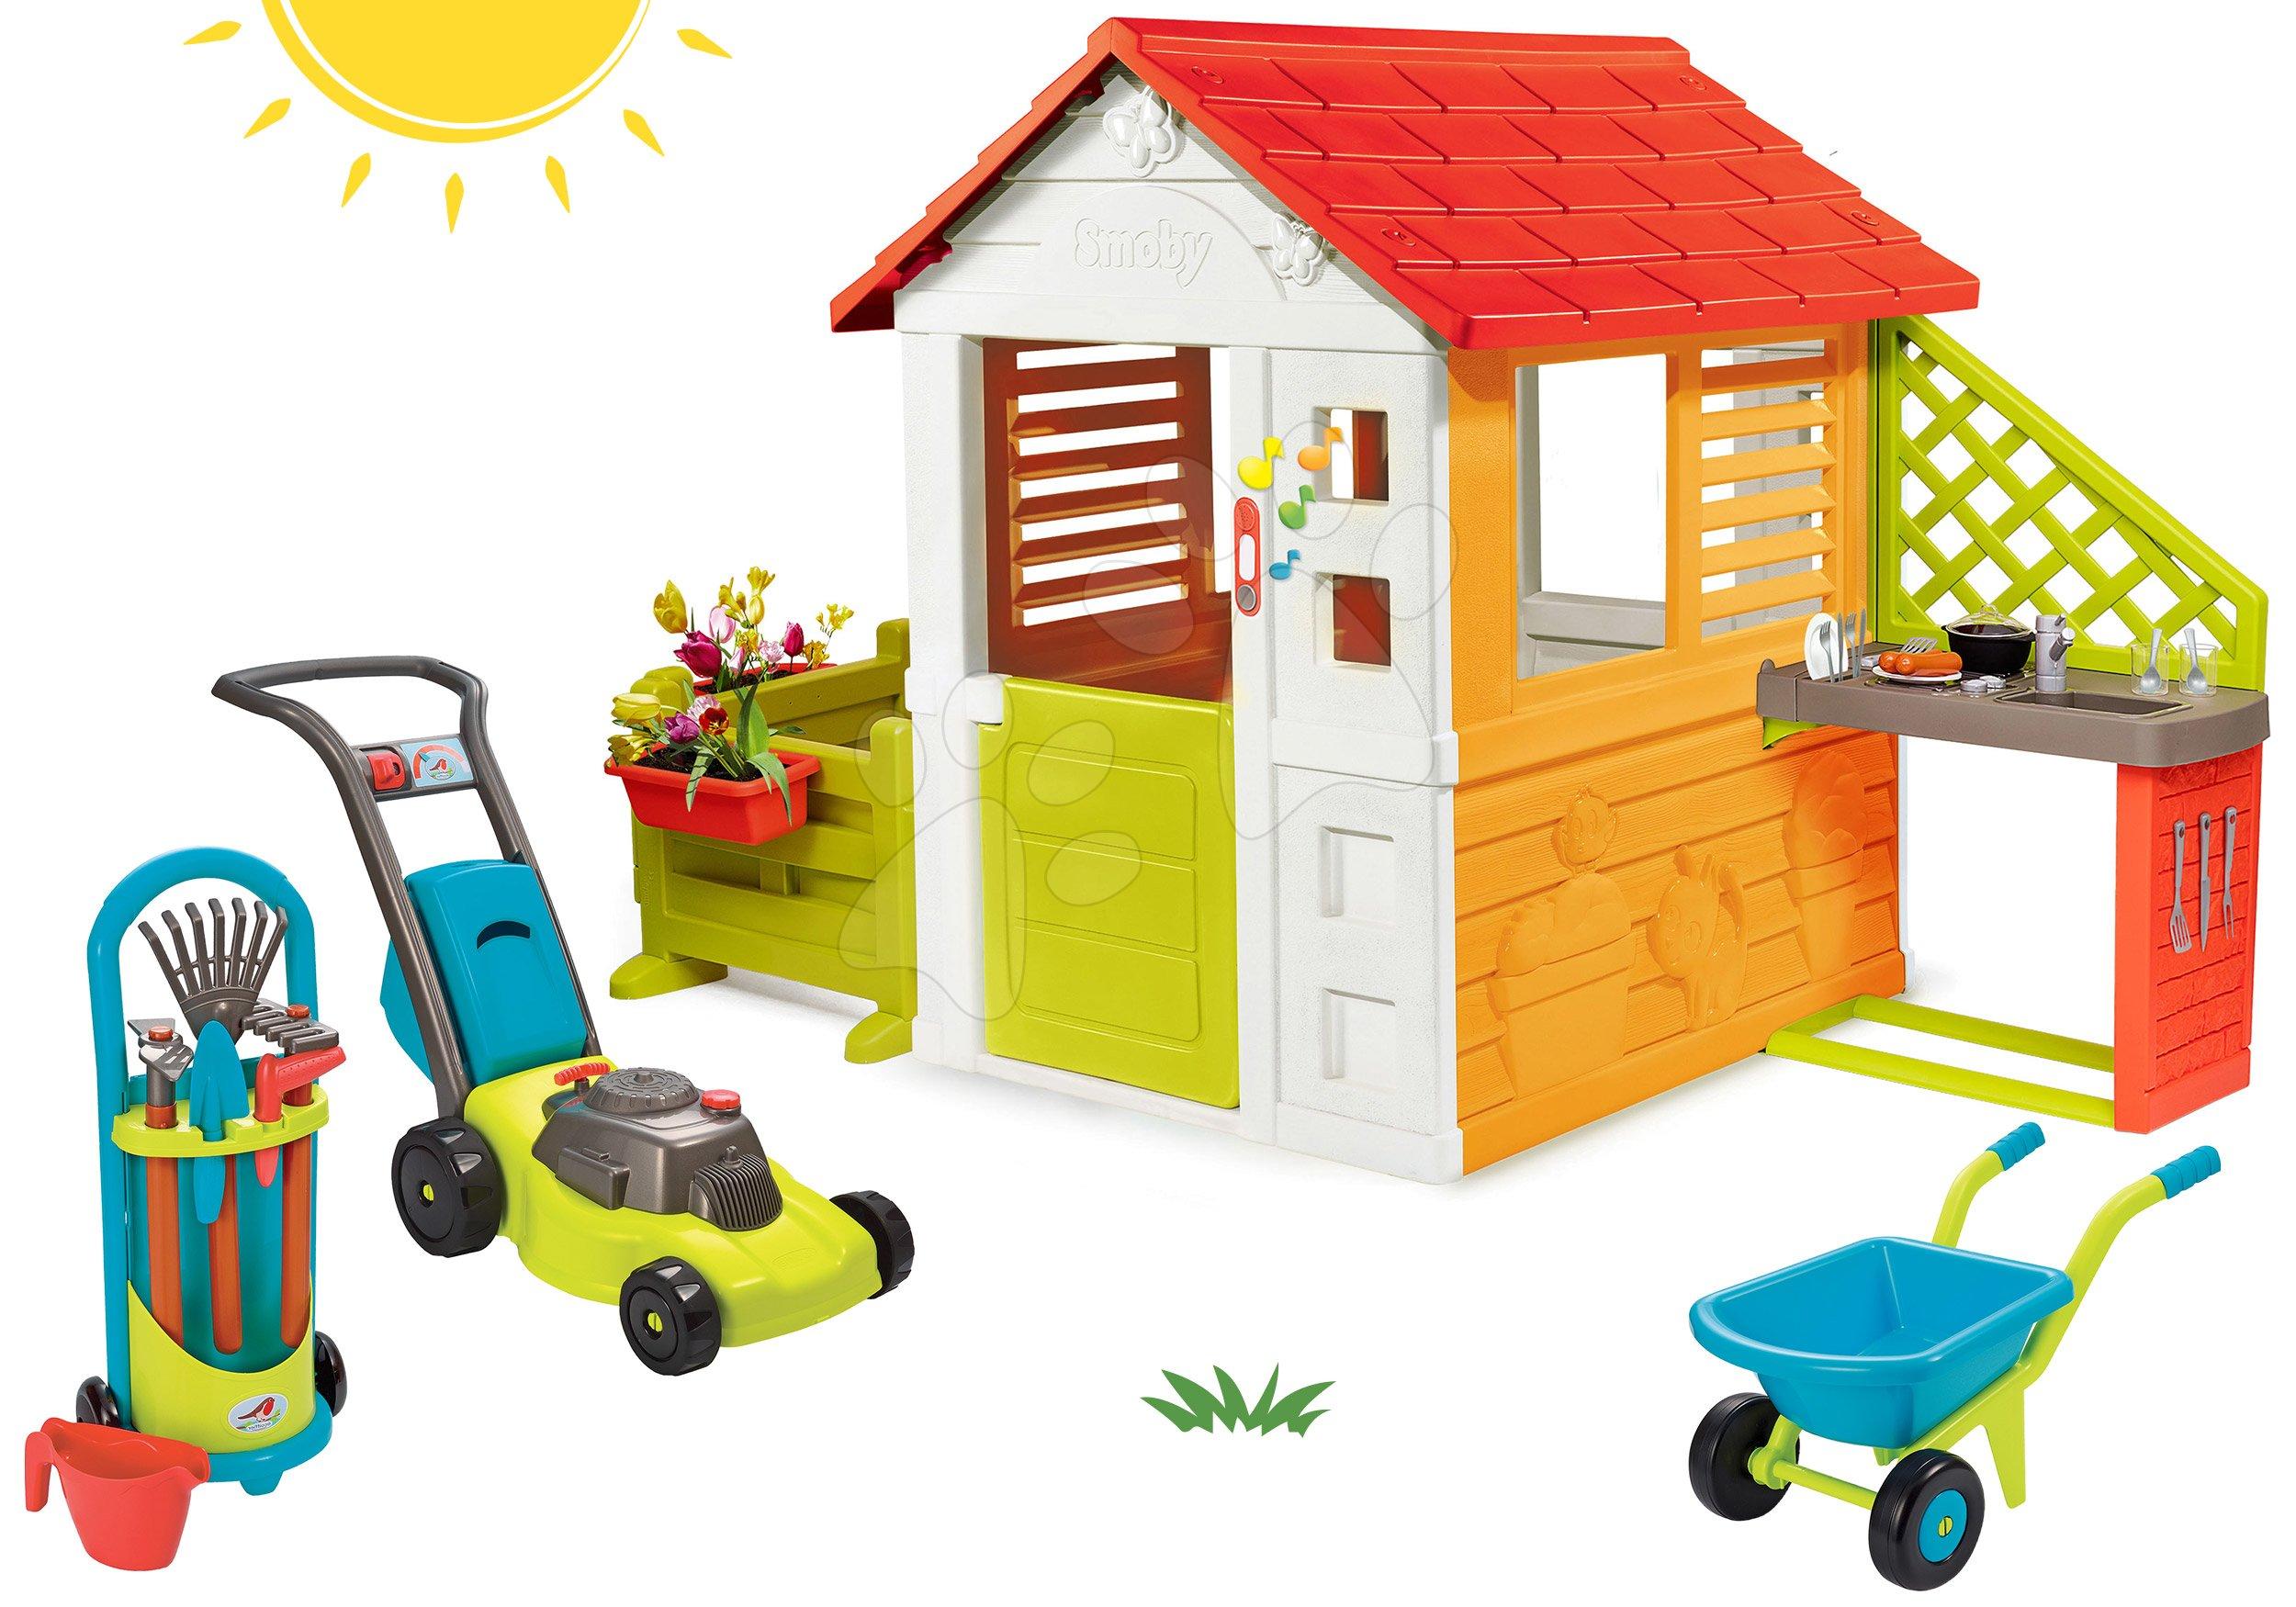 Set domček Slniečko Sunny Smoby s kuchynkou a záhradka s pracovným náradímod 24 mes